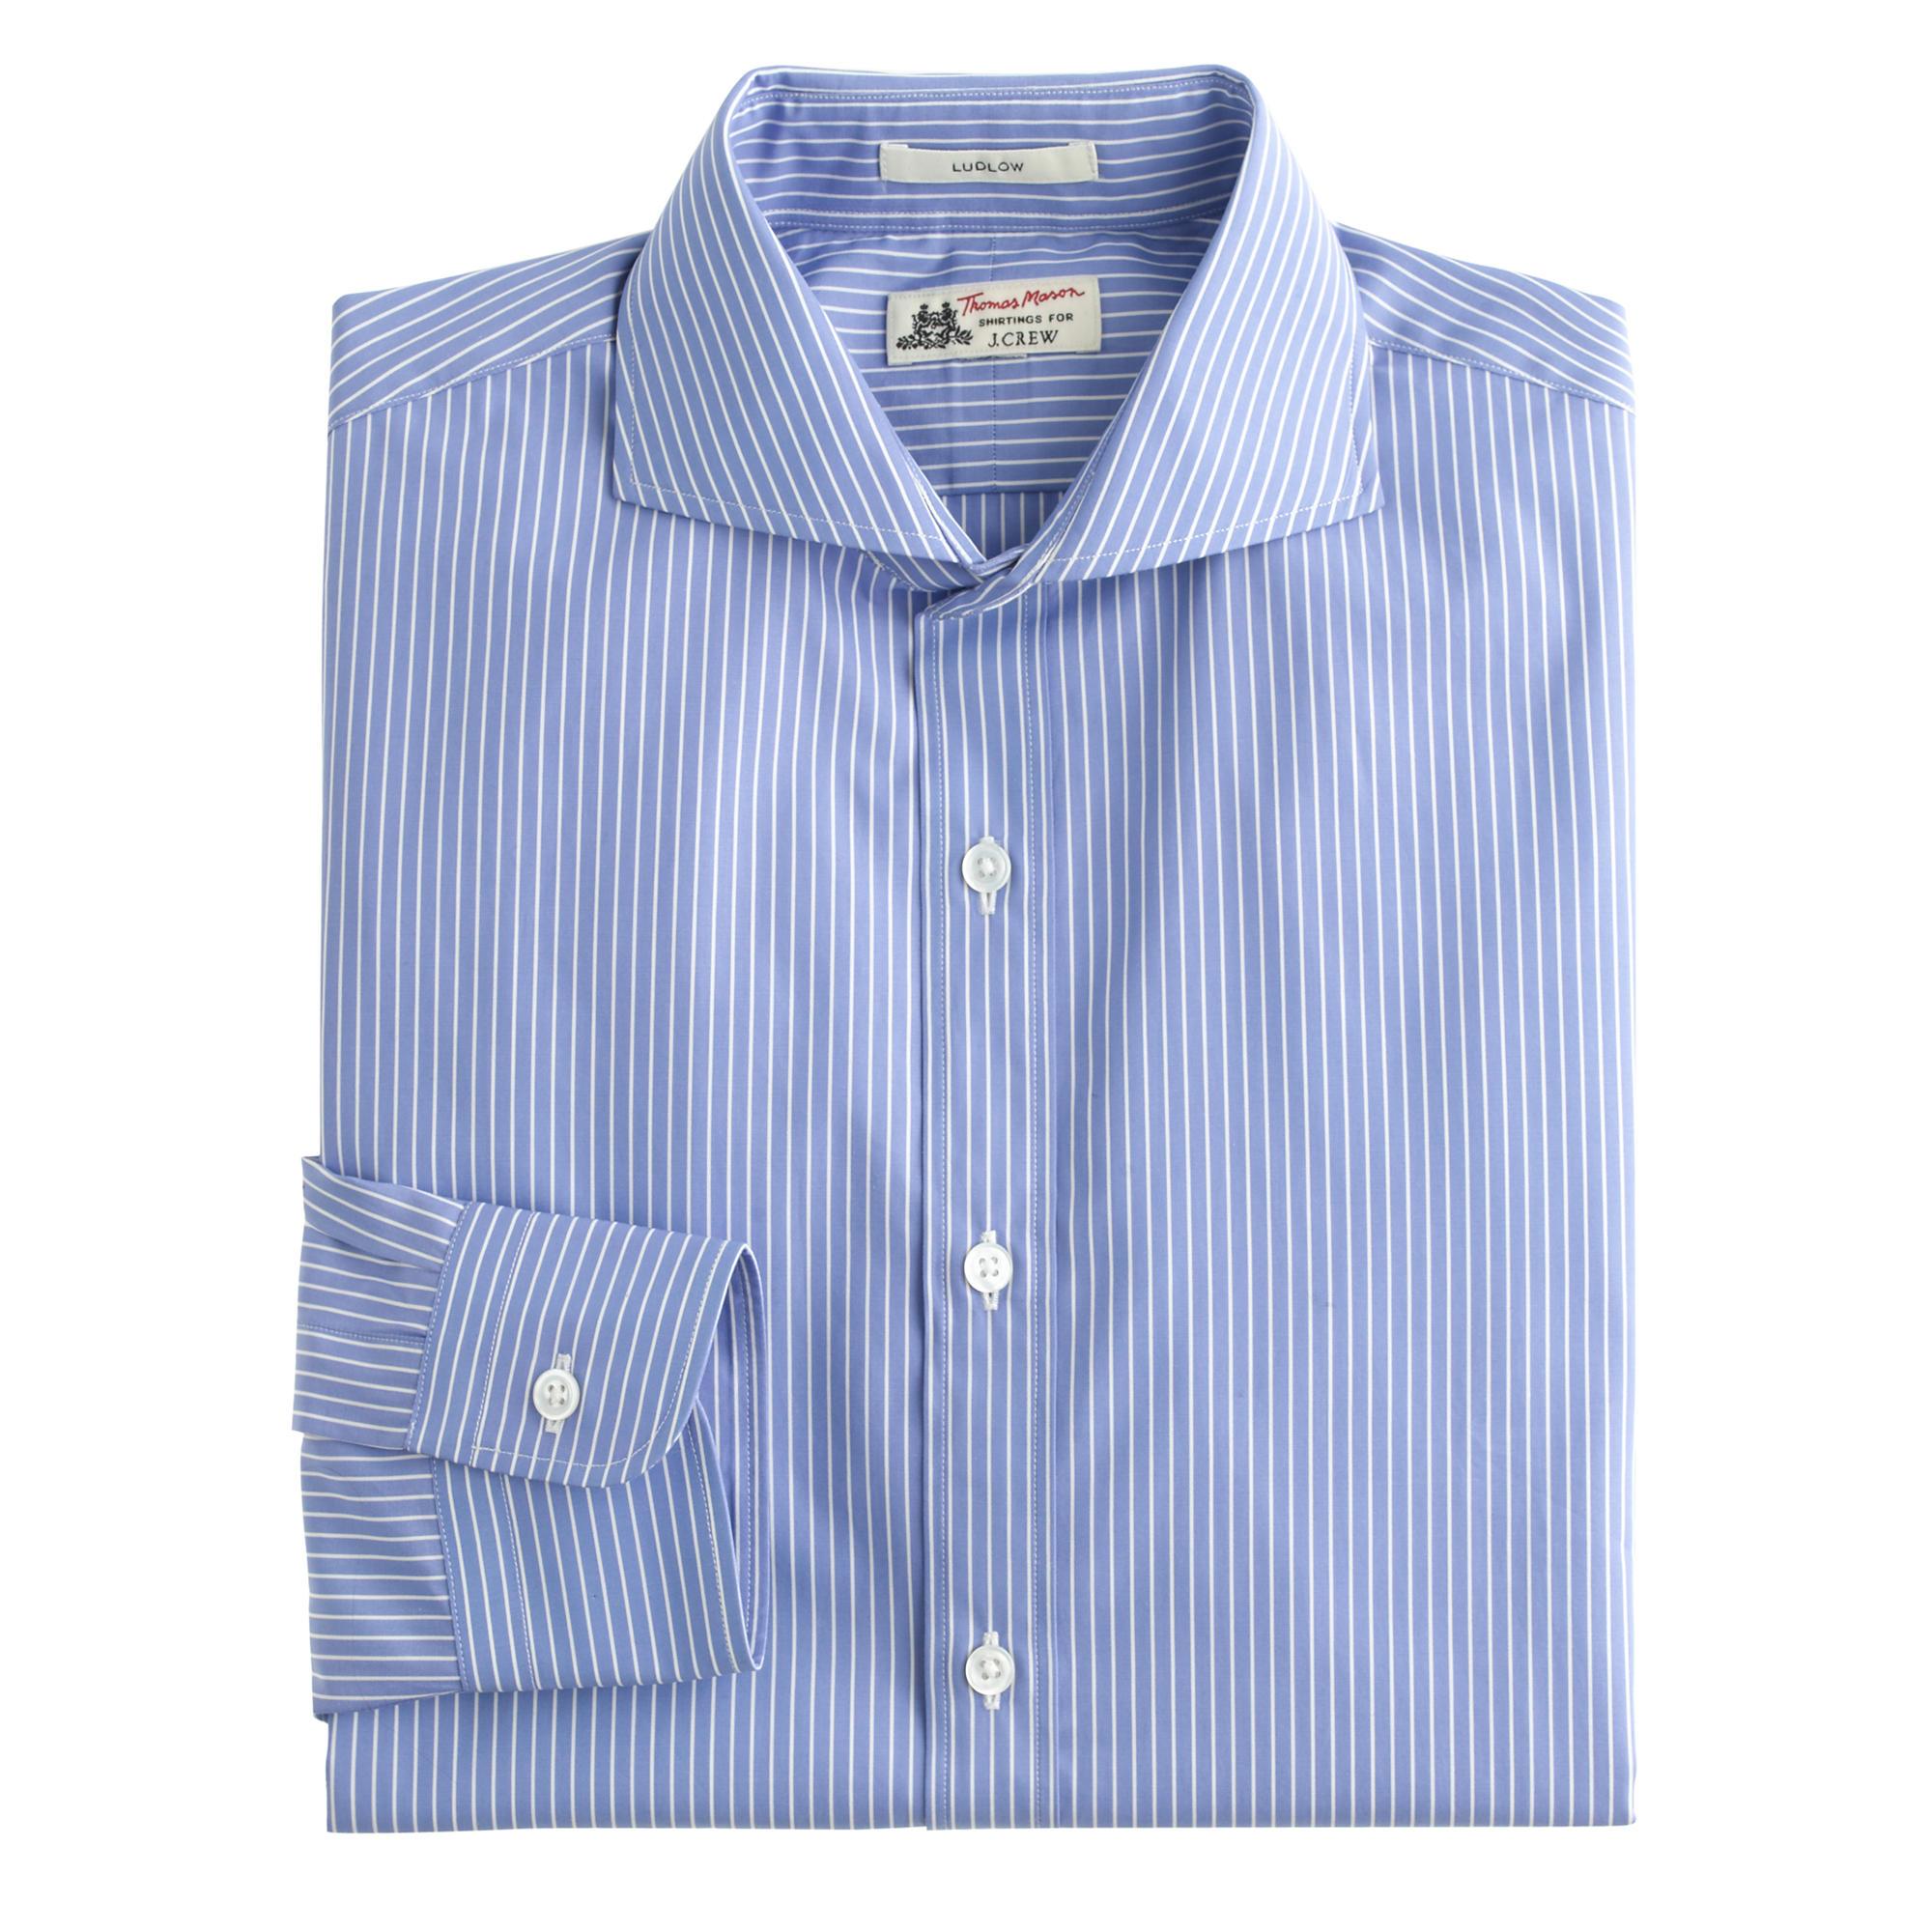 Lyst j crew thomas mason ludlow shirt in atlantic blue for Thomas mason dress shirts